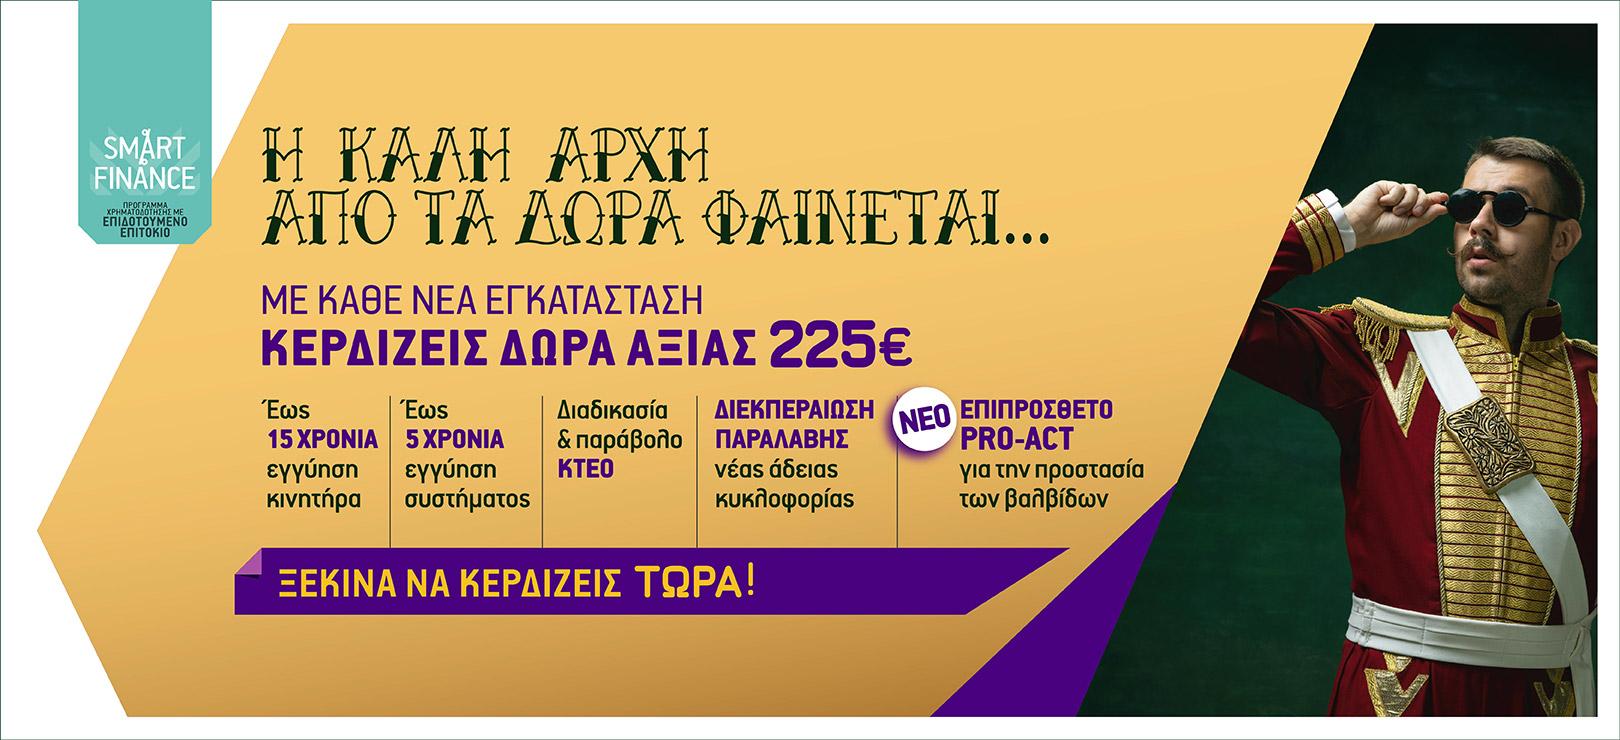 1st-2021-campaign-Banner-Slideshow-1620x740-02